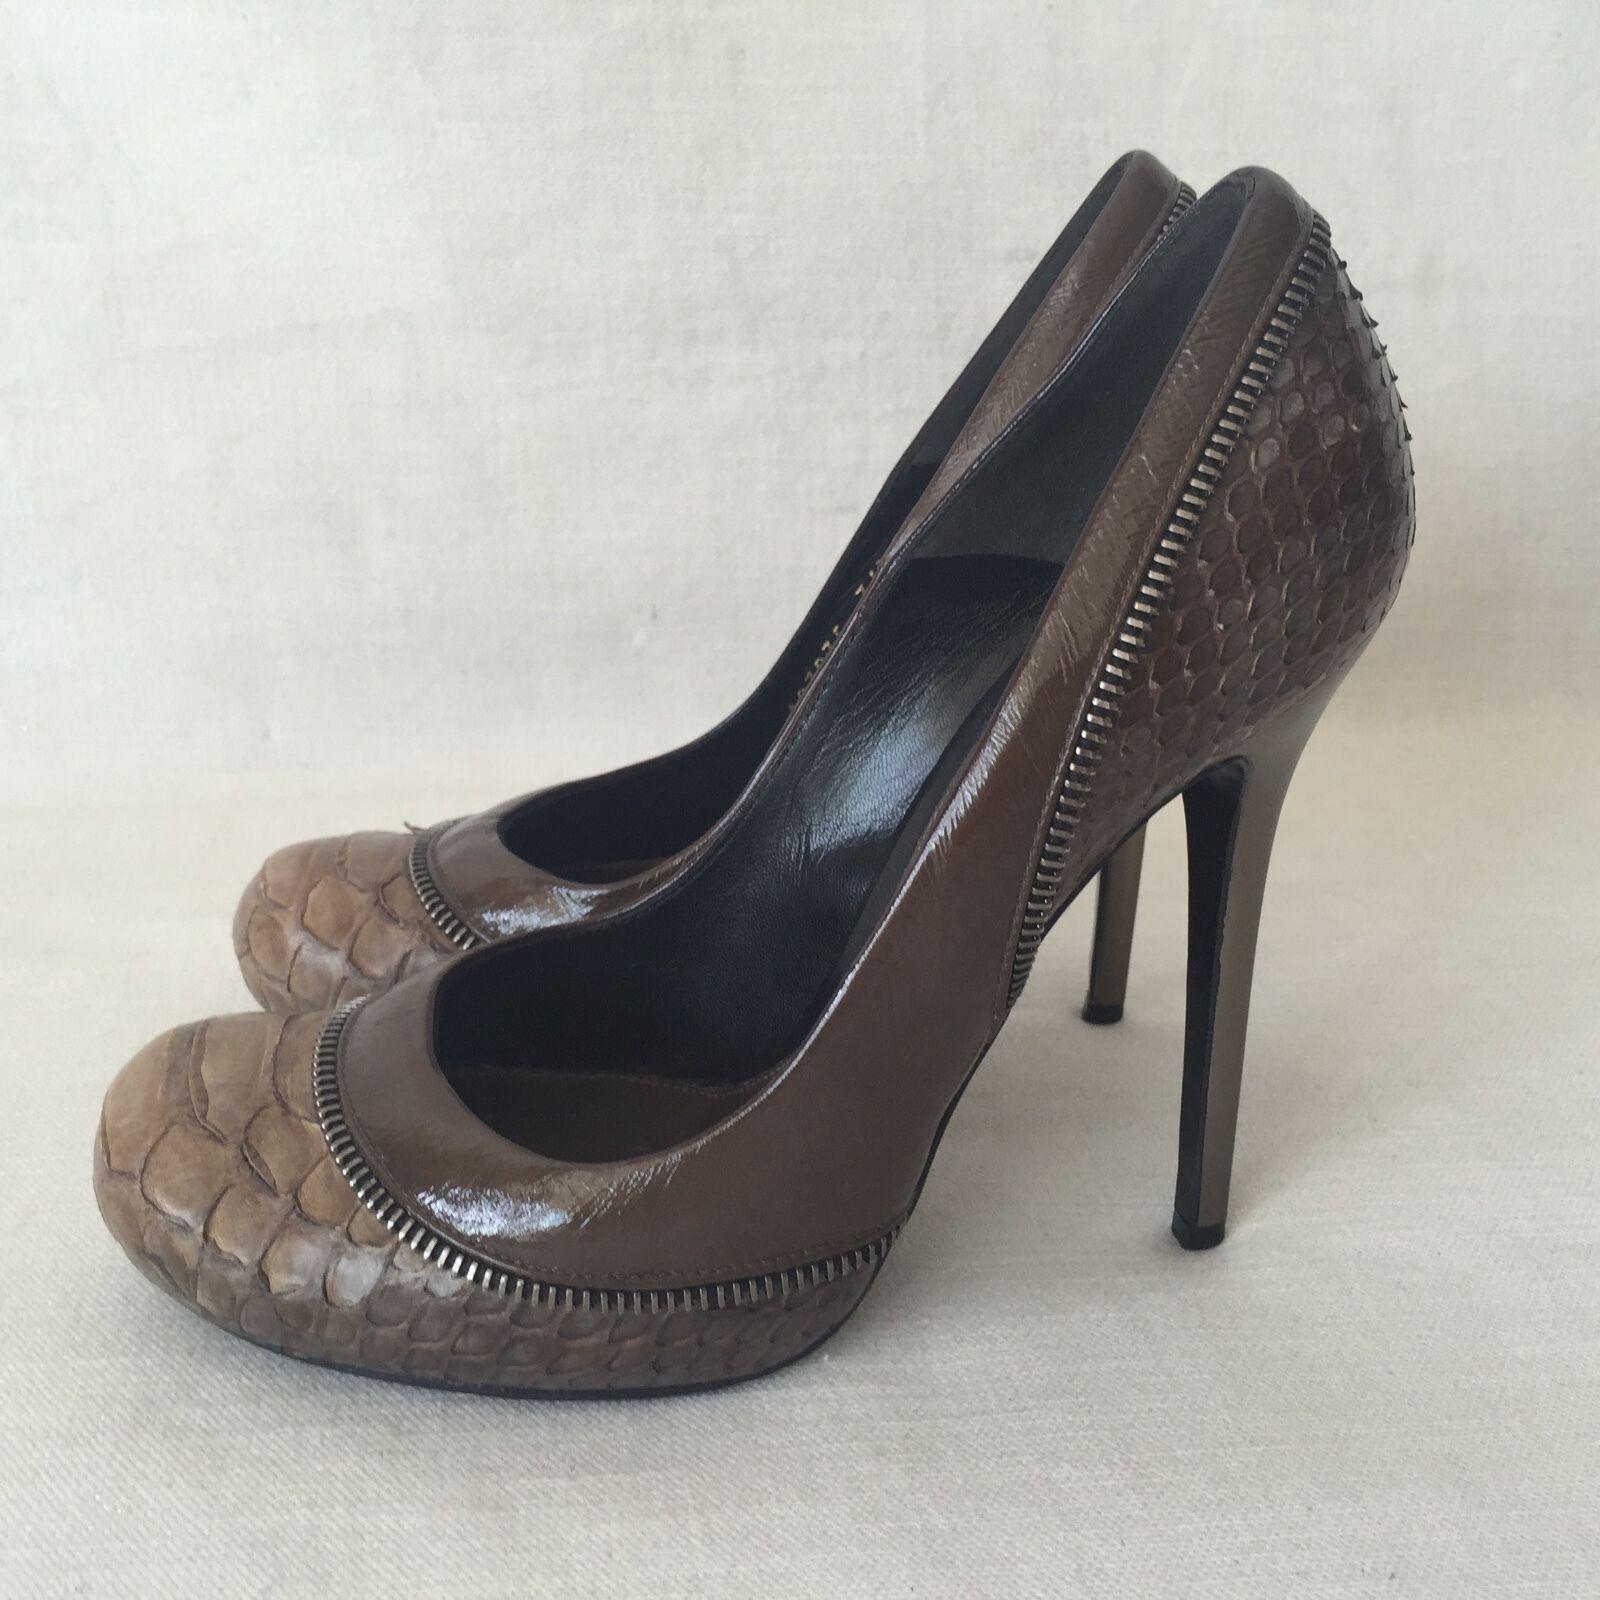 Alexander McQueen Marronee Snakeskin Heel Pump Python Zip Patent Dimensione  36.5 US 6.5  Sito ufficiale